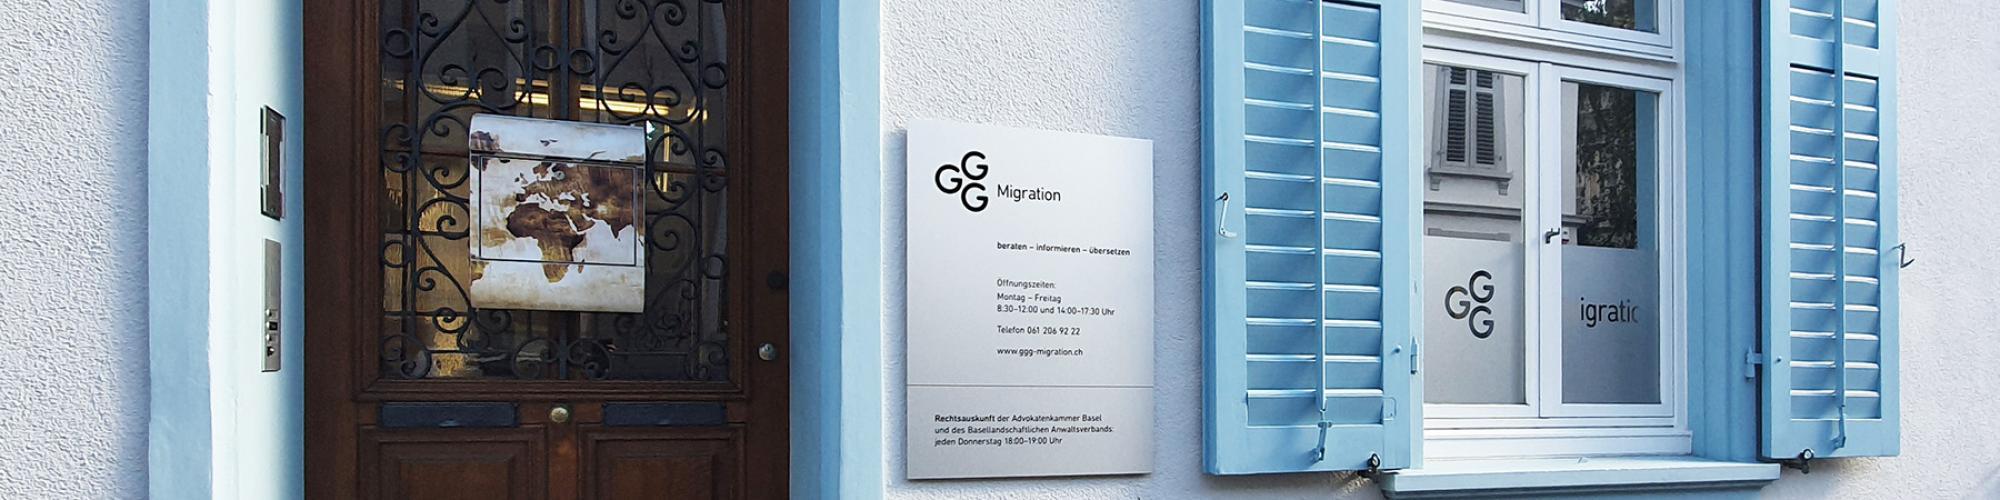 GGG Migration